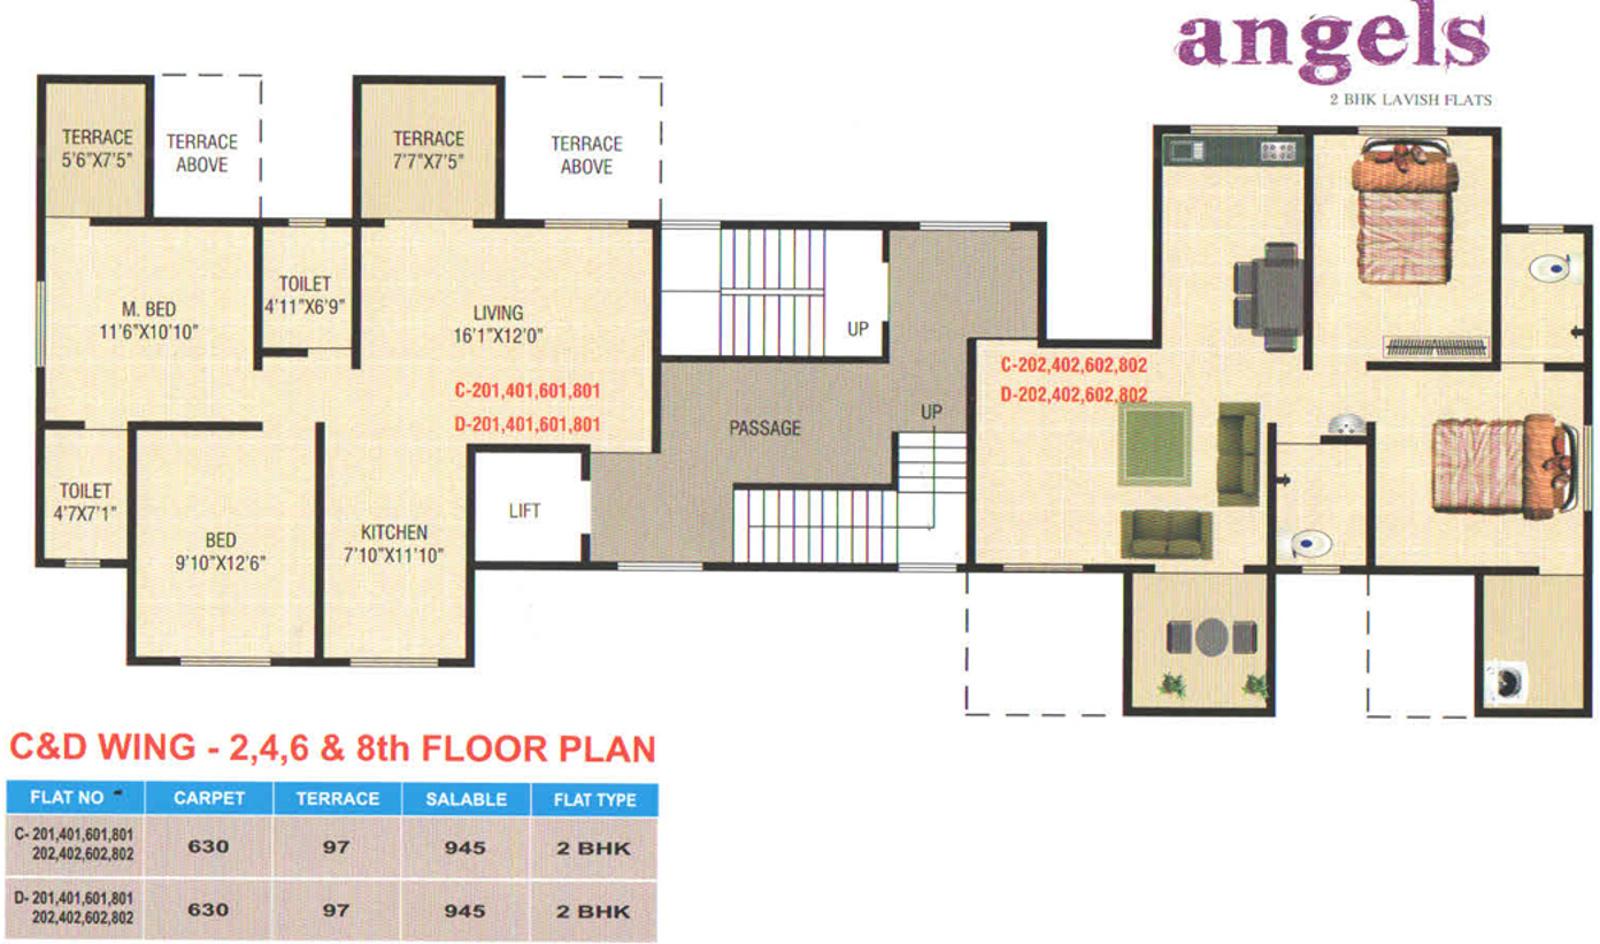 KK Angels in Rahatani, Pune - Price, Location Map, Floor